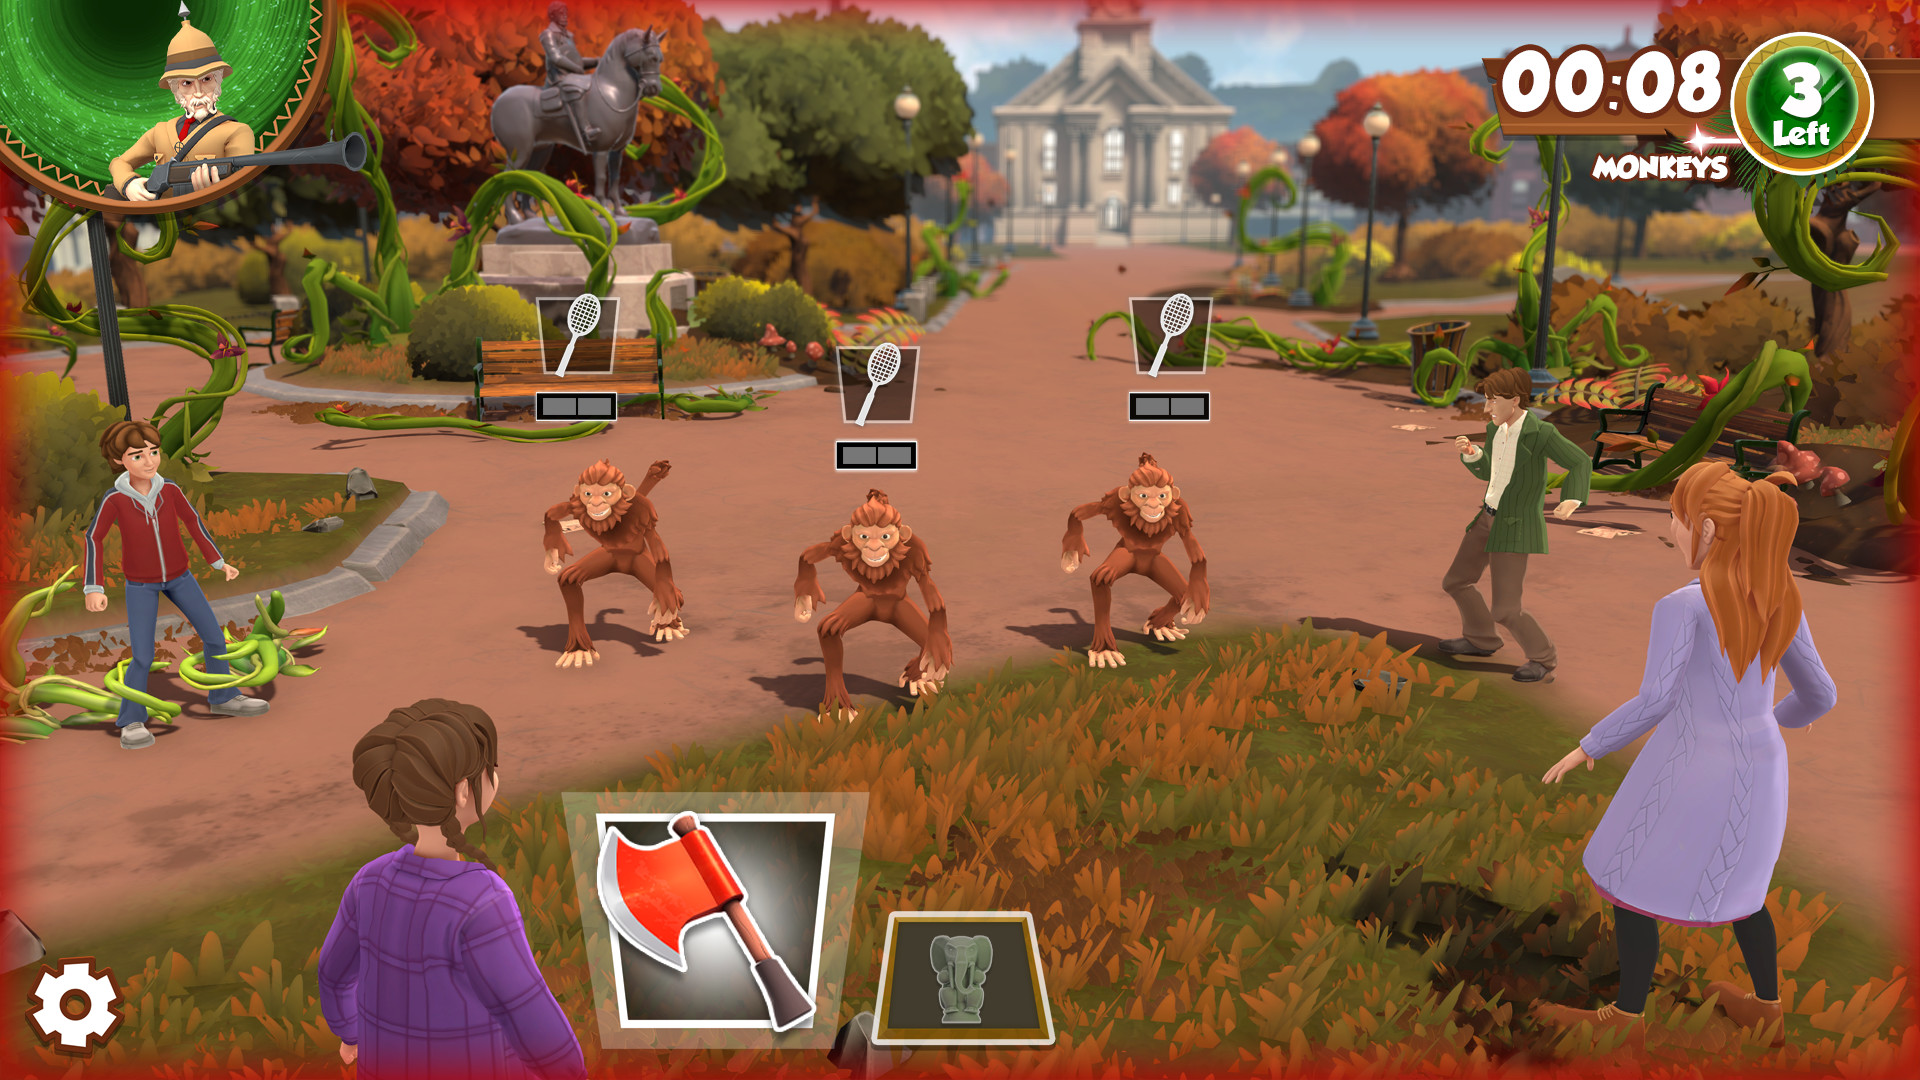 JUMANJI: The Curse Returns Free Download